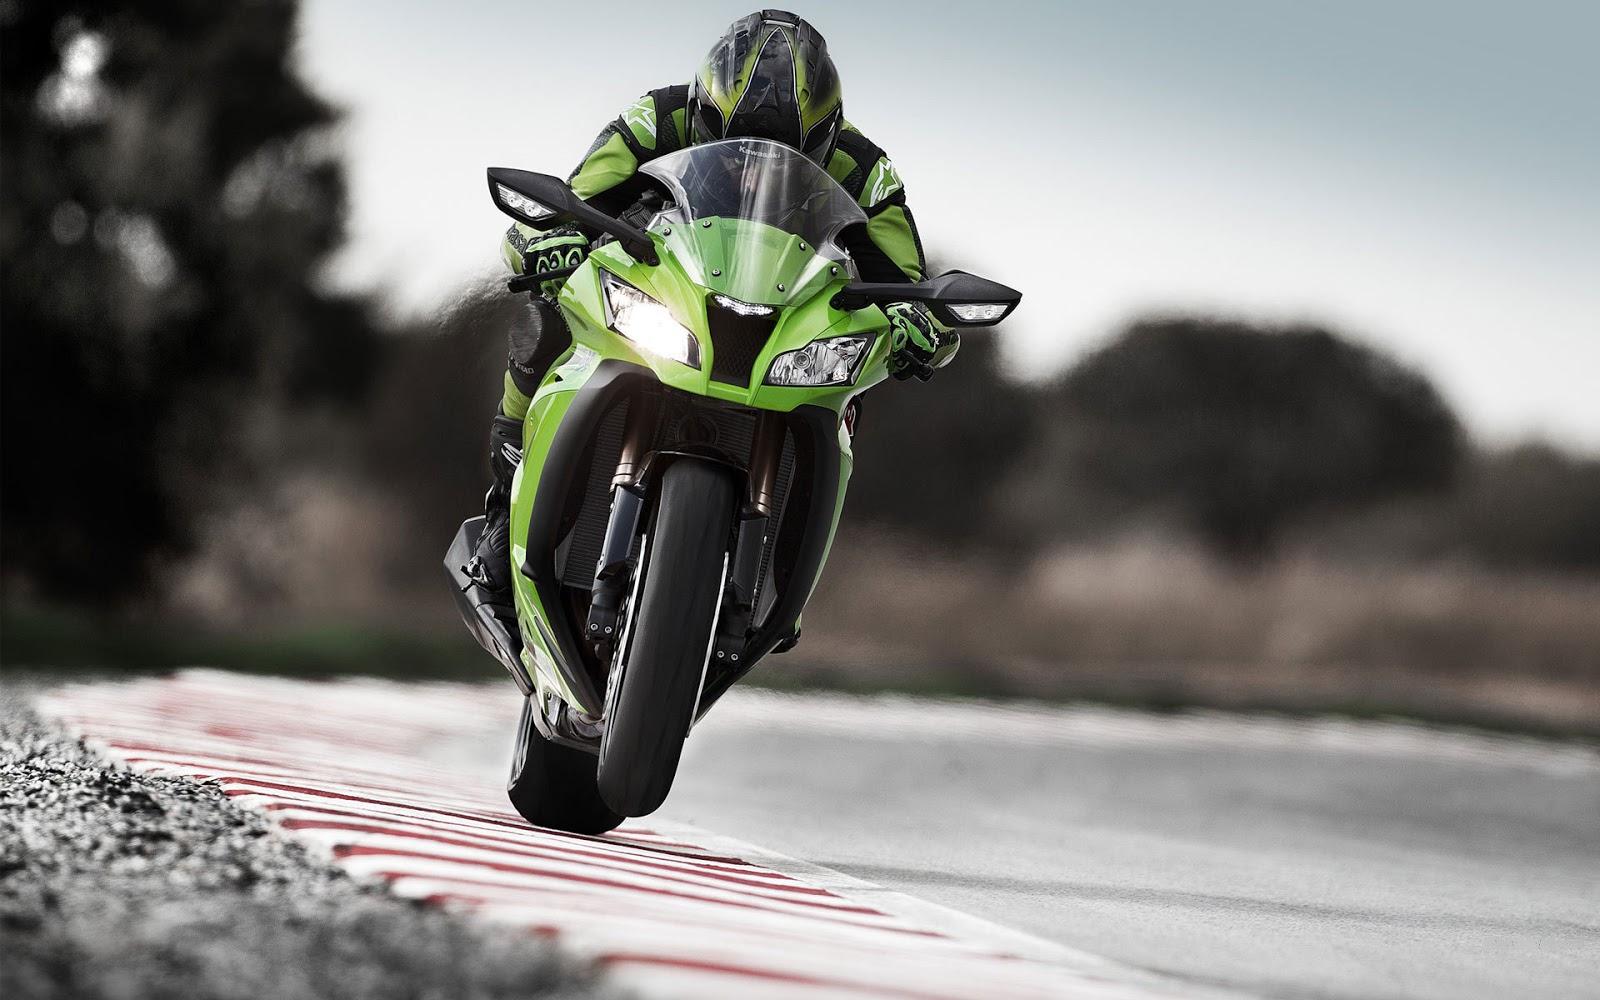 motorbike wallpapers hd quality 2013 ~ open gangnam style